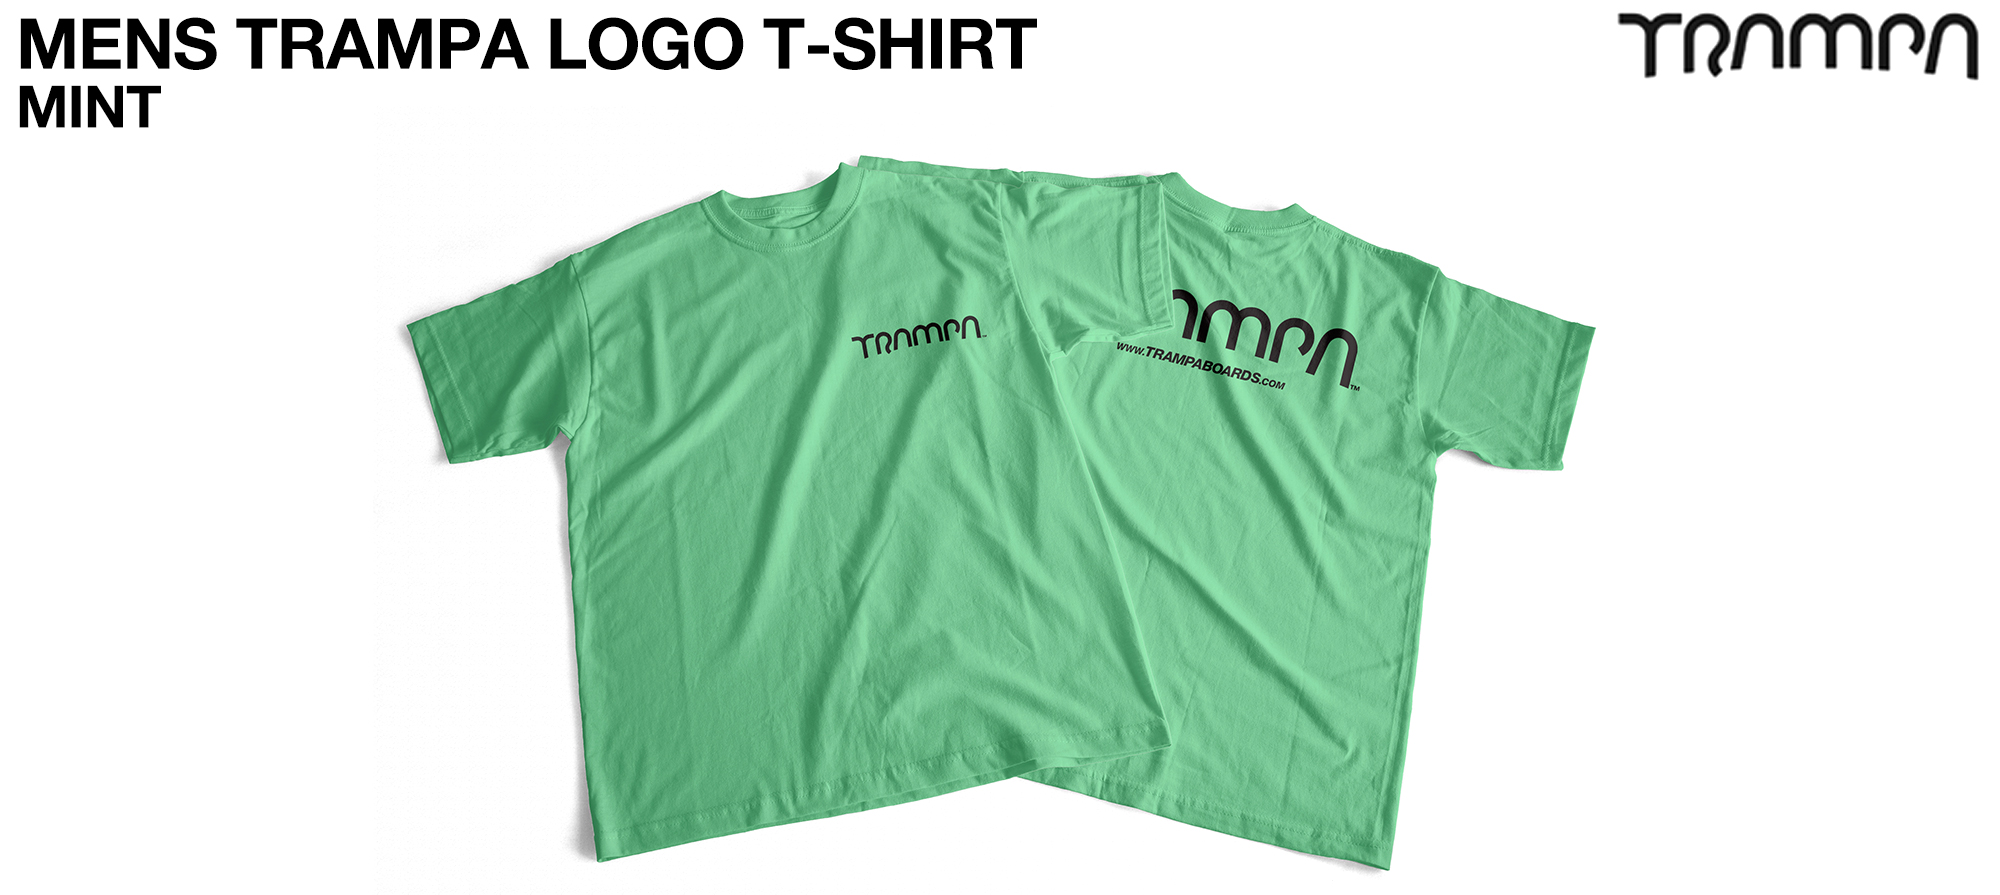 Gildan T  TRAMPA LOGO Mint - CUSTOM